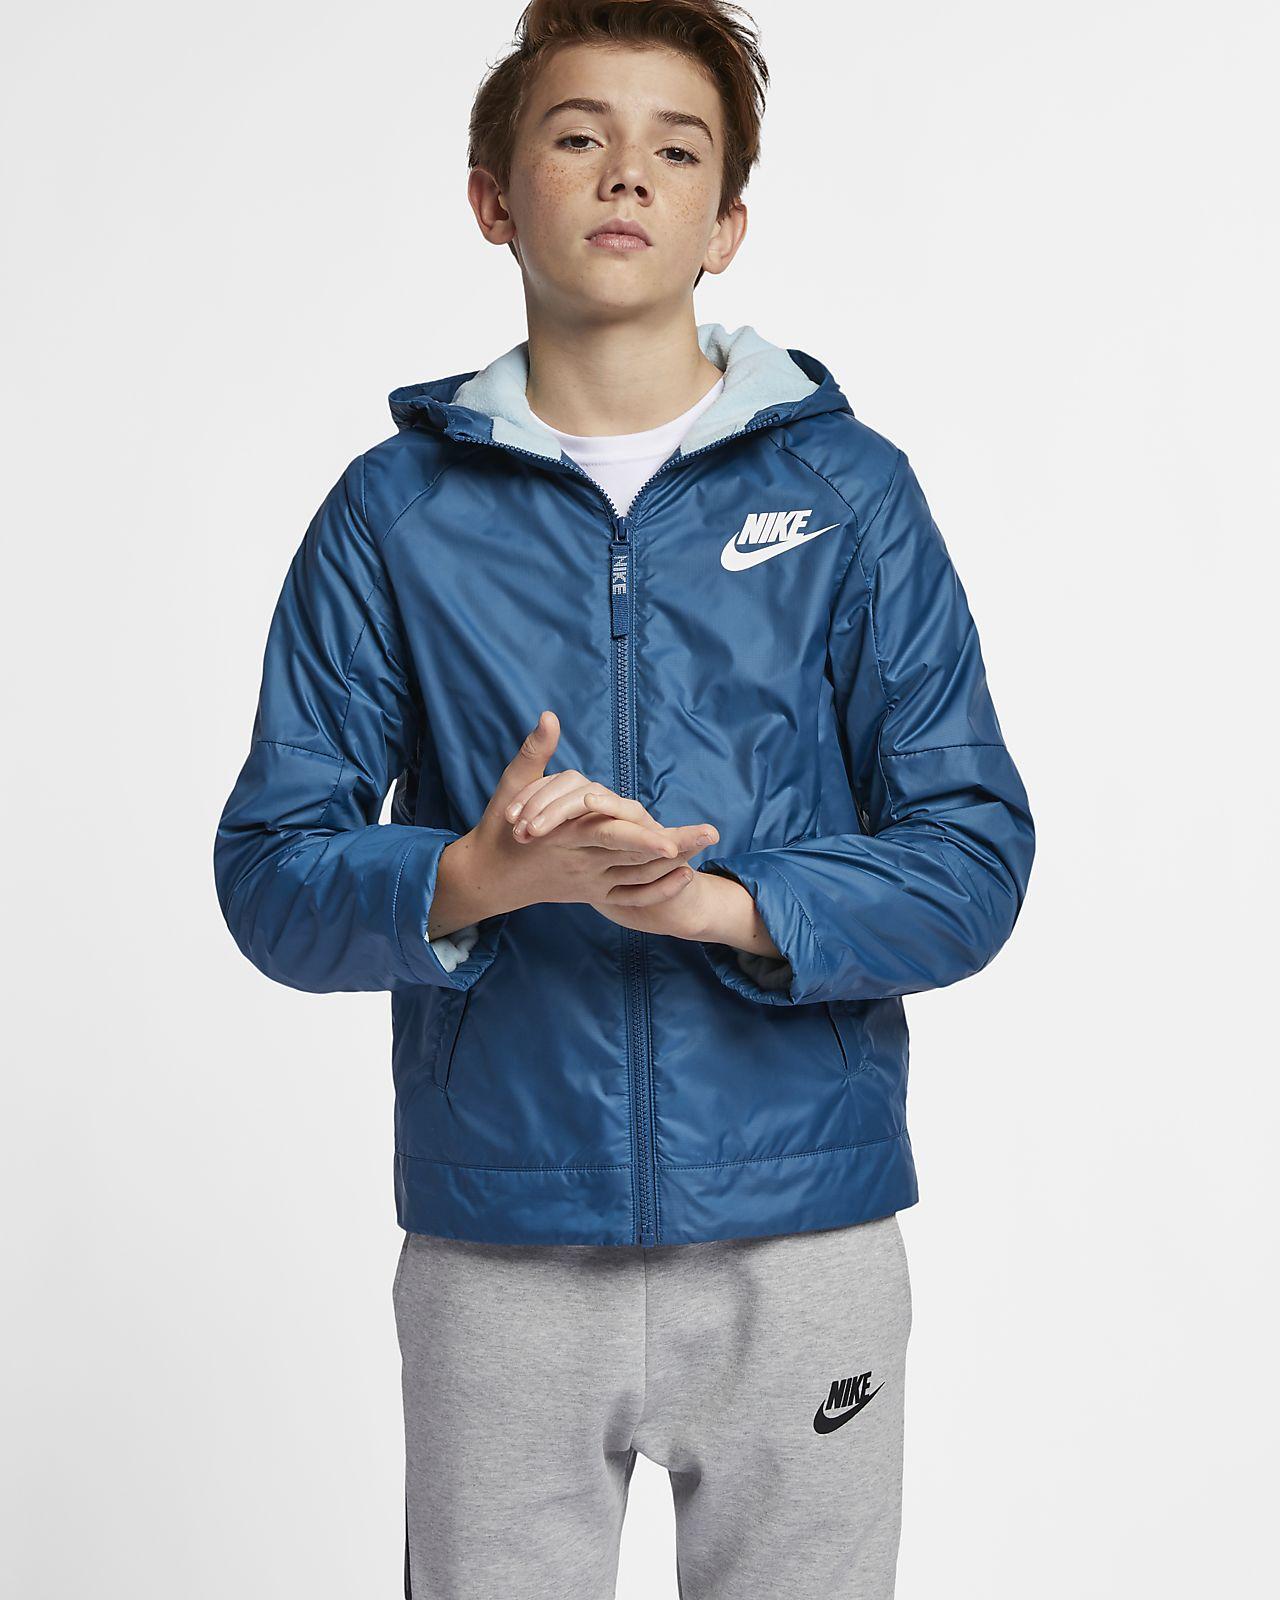 2ab23464db Nike Sportswear Older Kids' Jacket. Nike.com GB